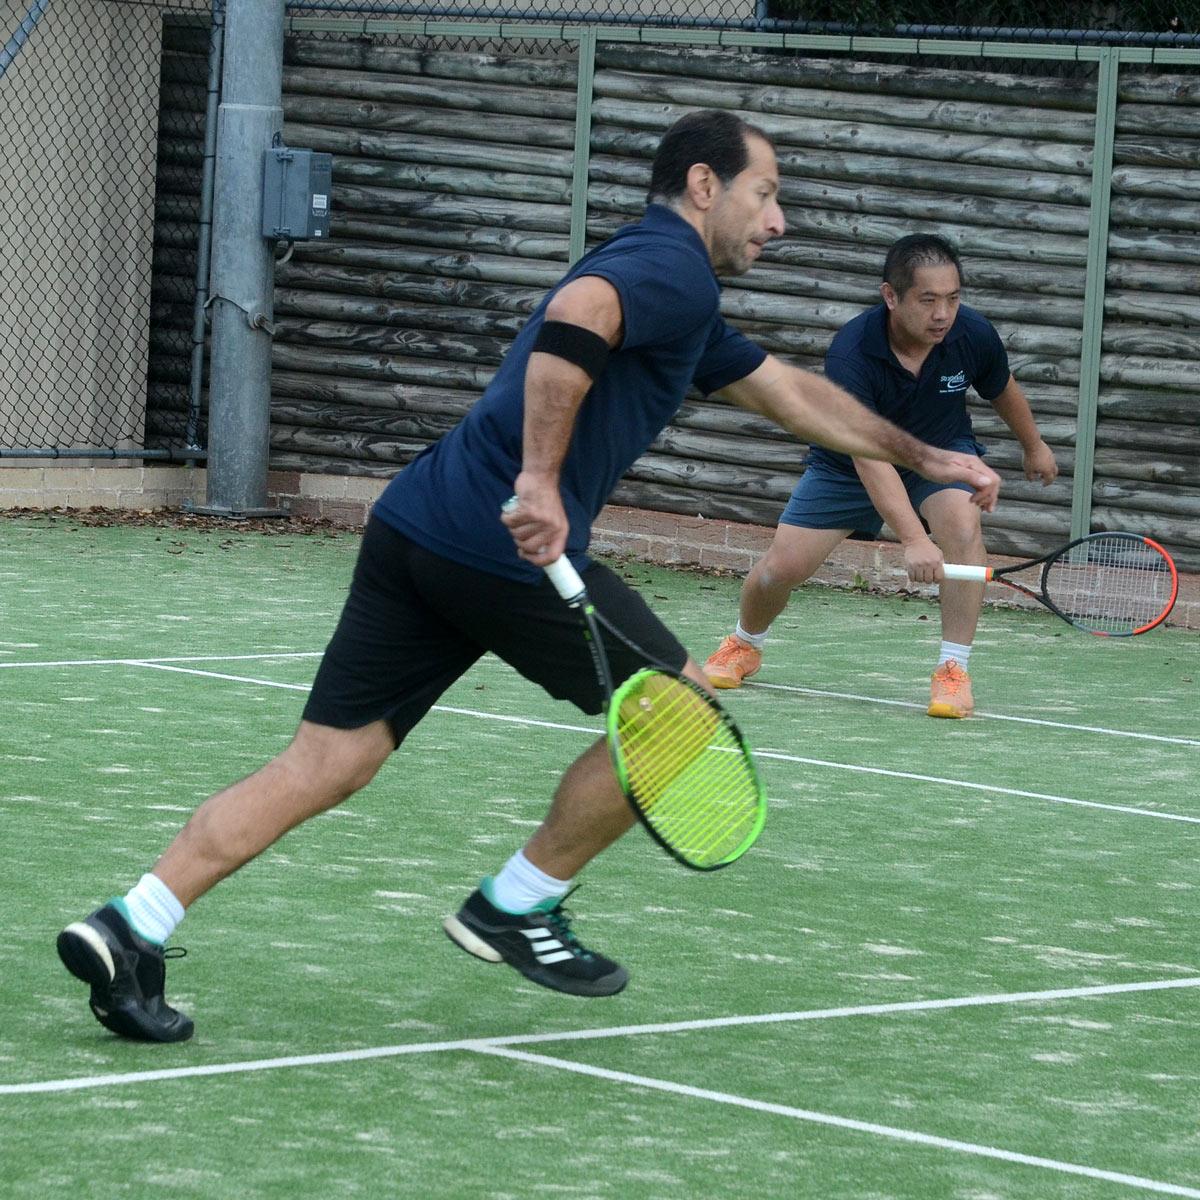 Sydney Tennis Player Running